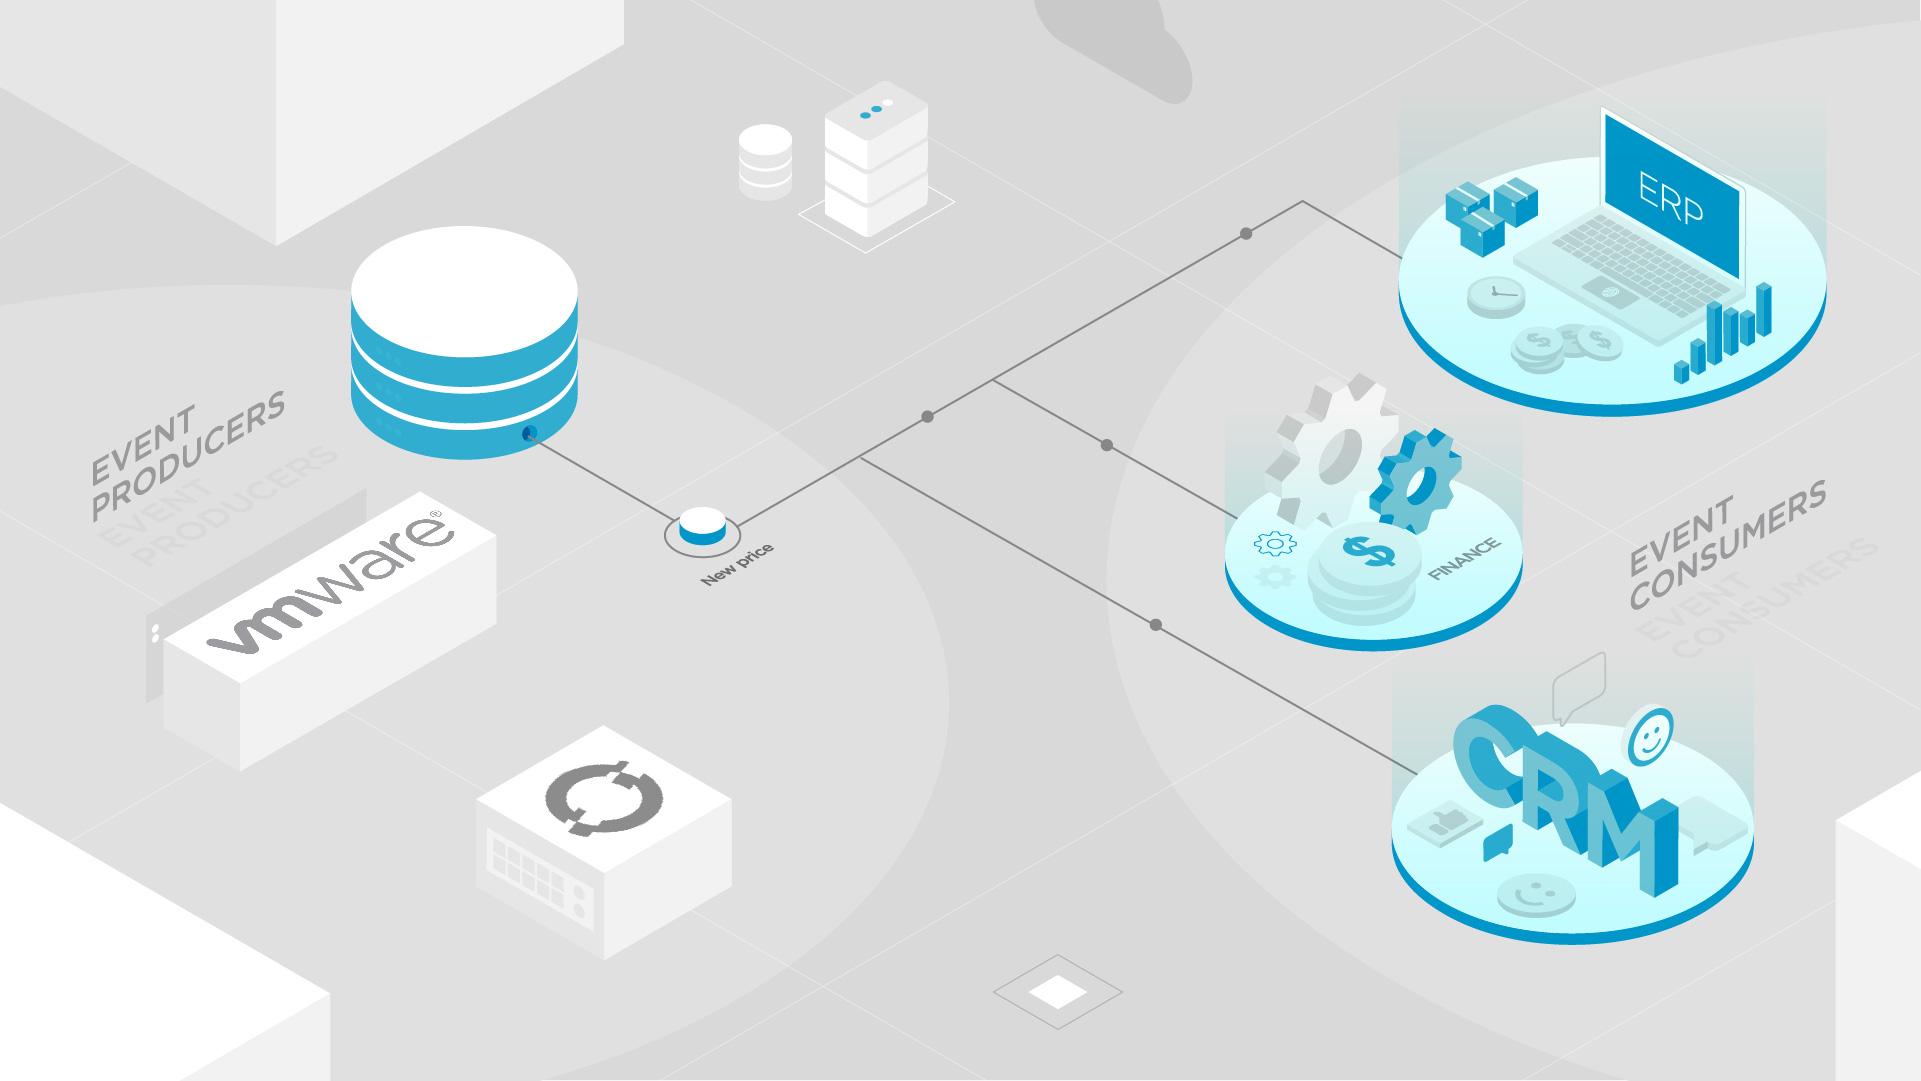 Knative-powered TriggerMesh Makes Modern Apps Serverless and Event-driven